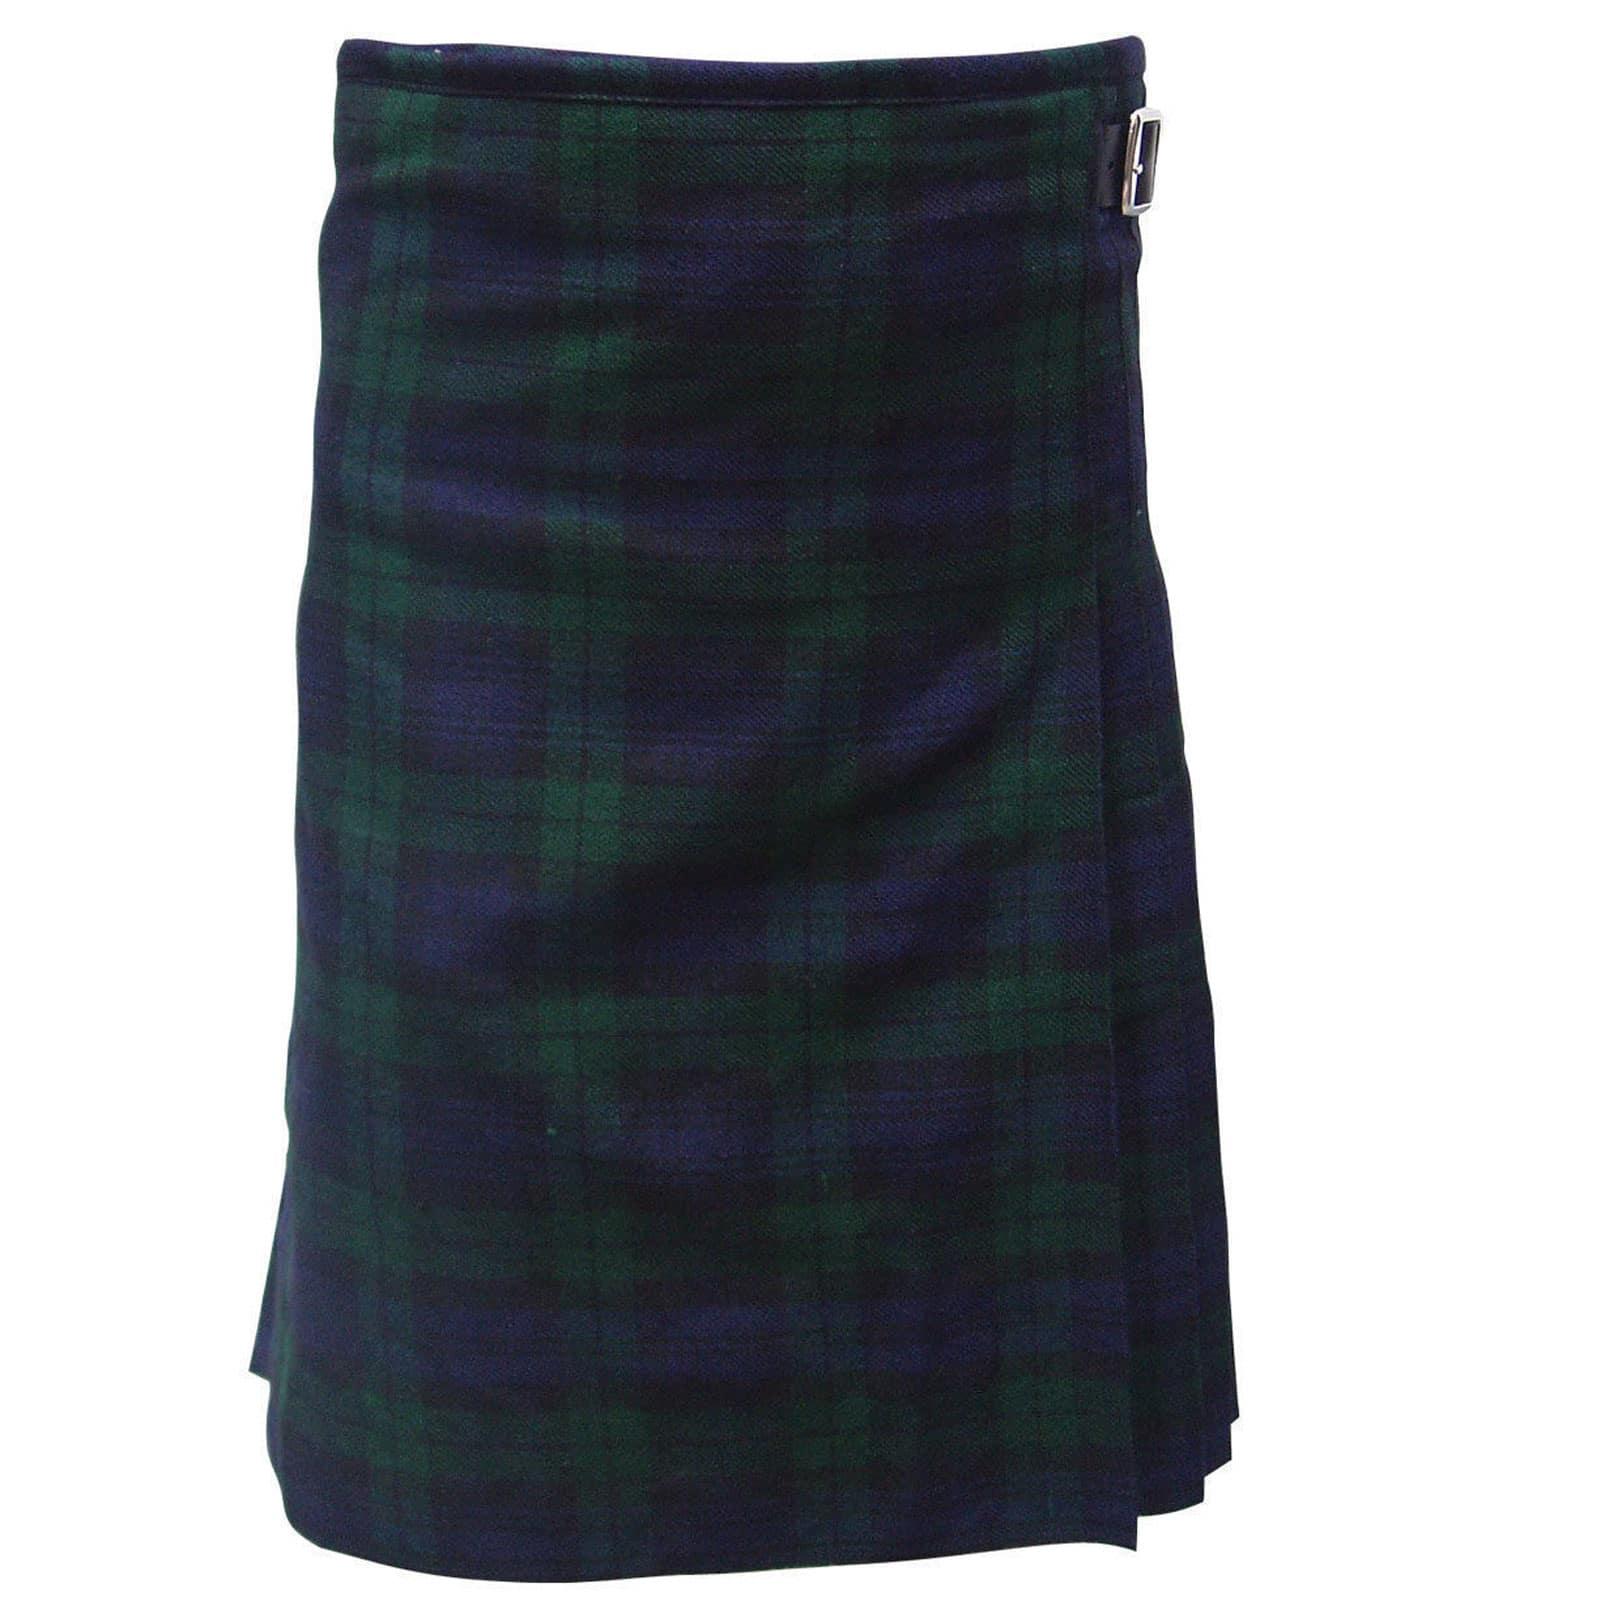 SALE SALE Black Watch Tartan kilt Custom Made Size Length Limited Time Offer GRGns